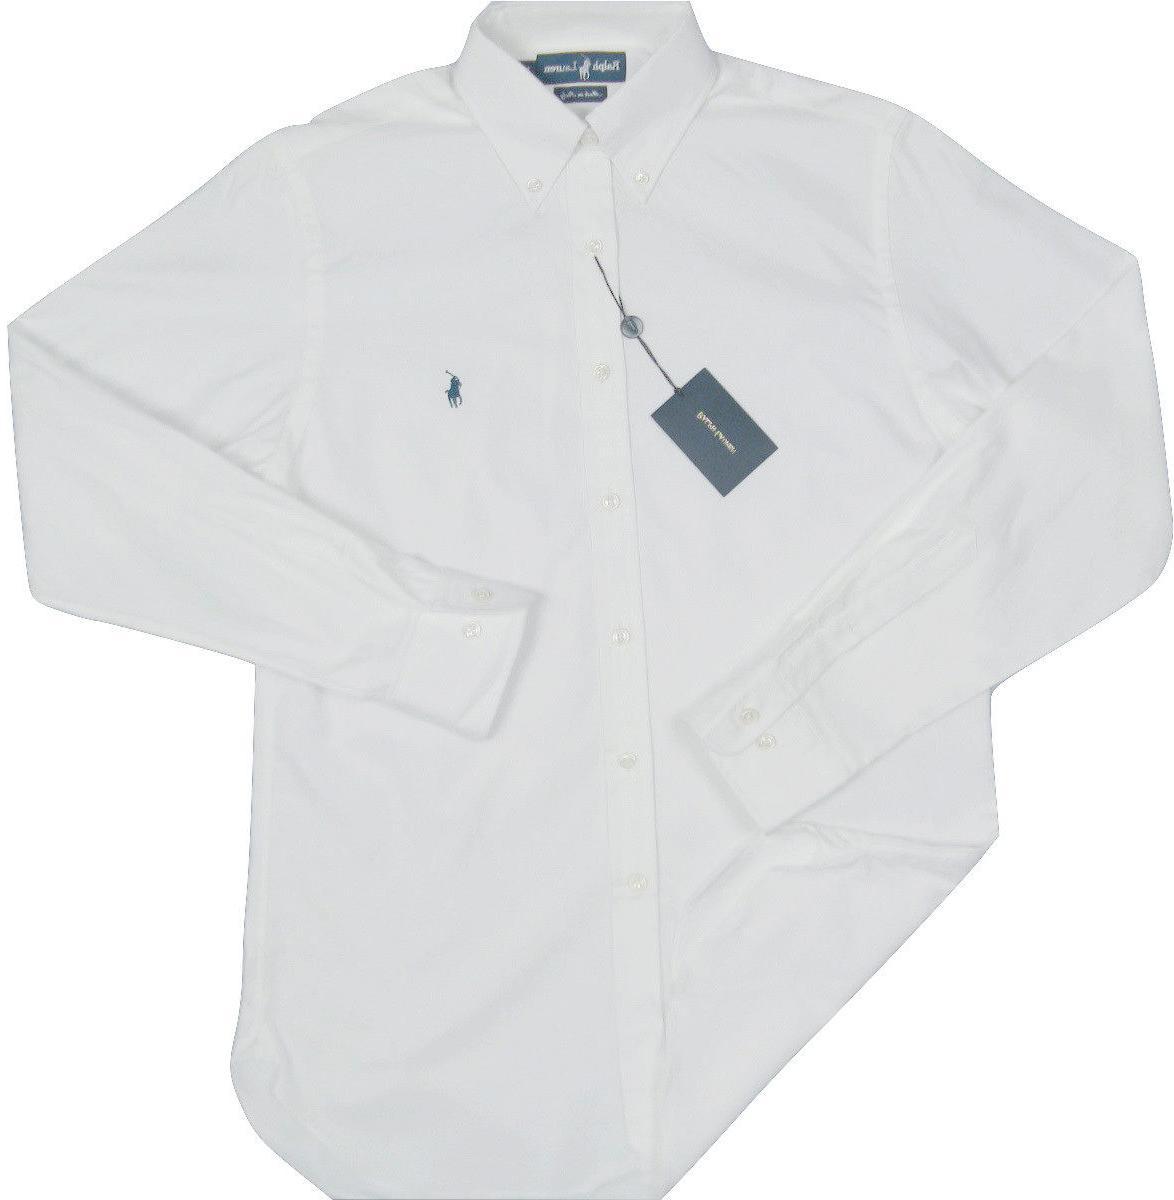 new 245 dress shirt pink blue white